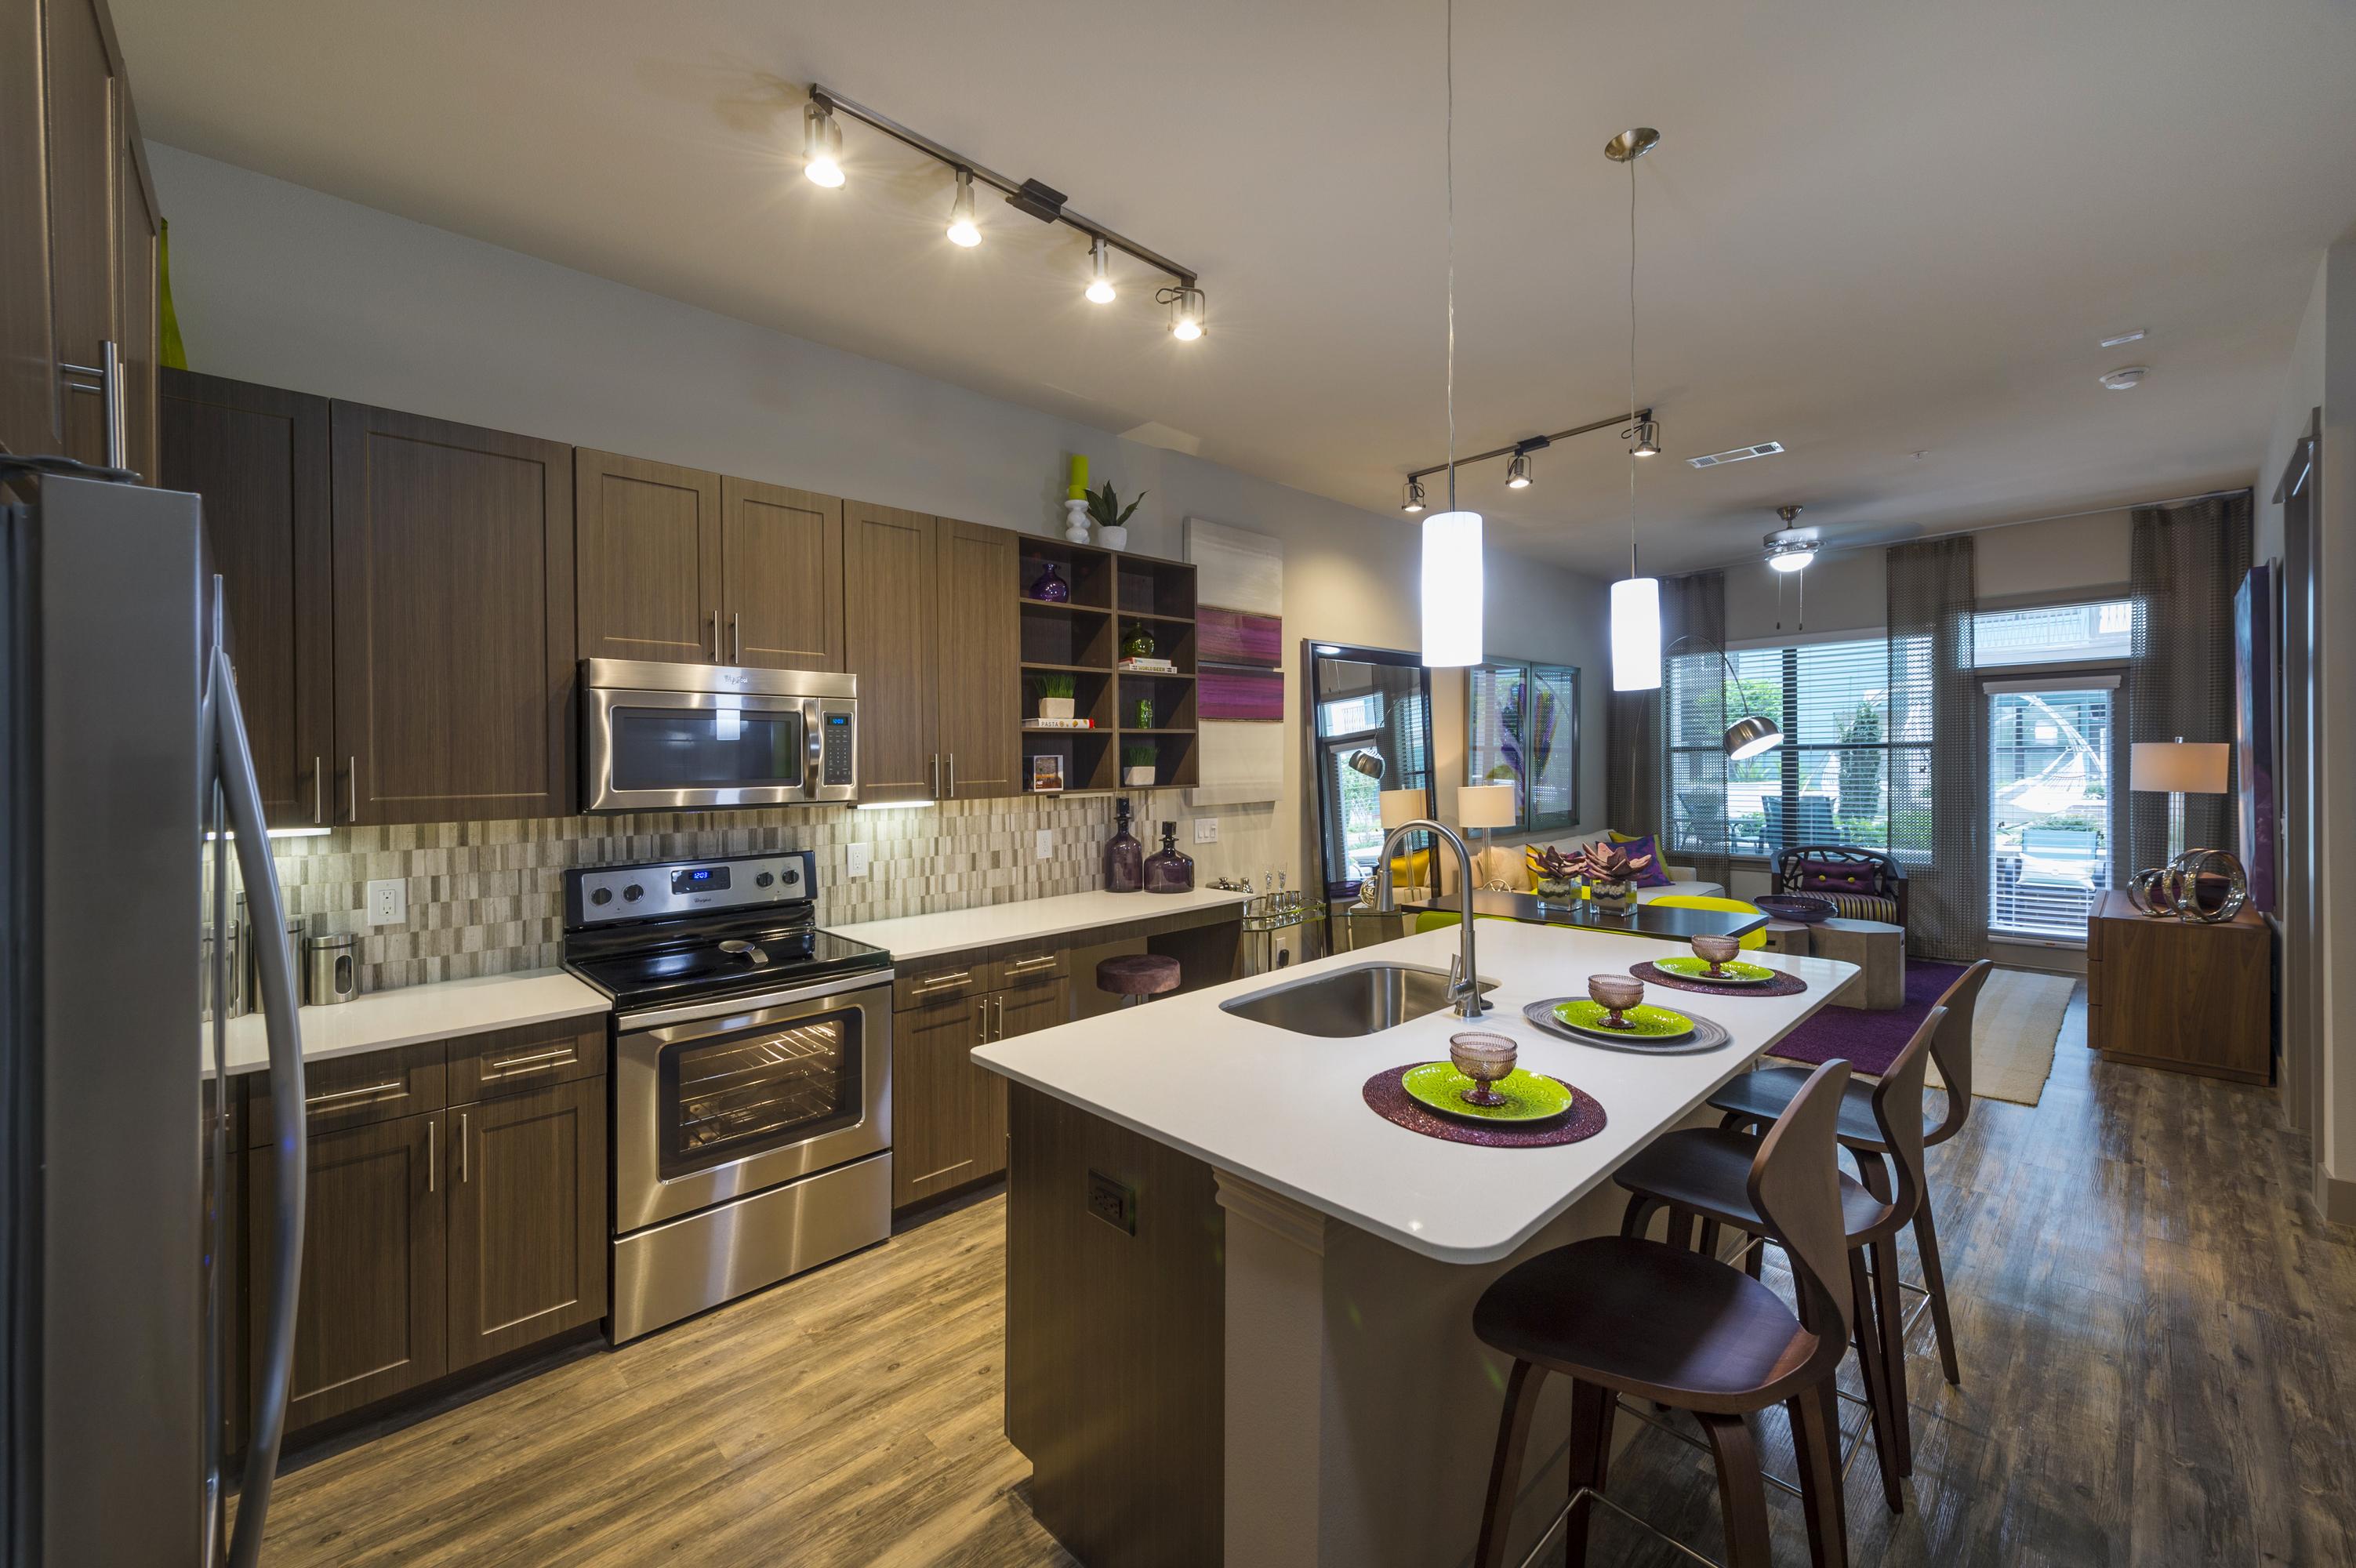 Top Apartments In The Washington Corridor| Apartment GURUS